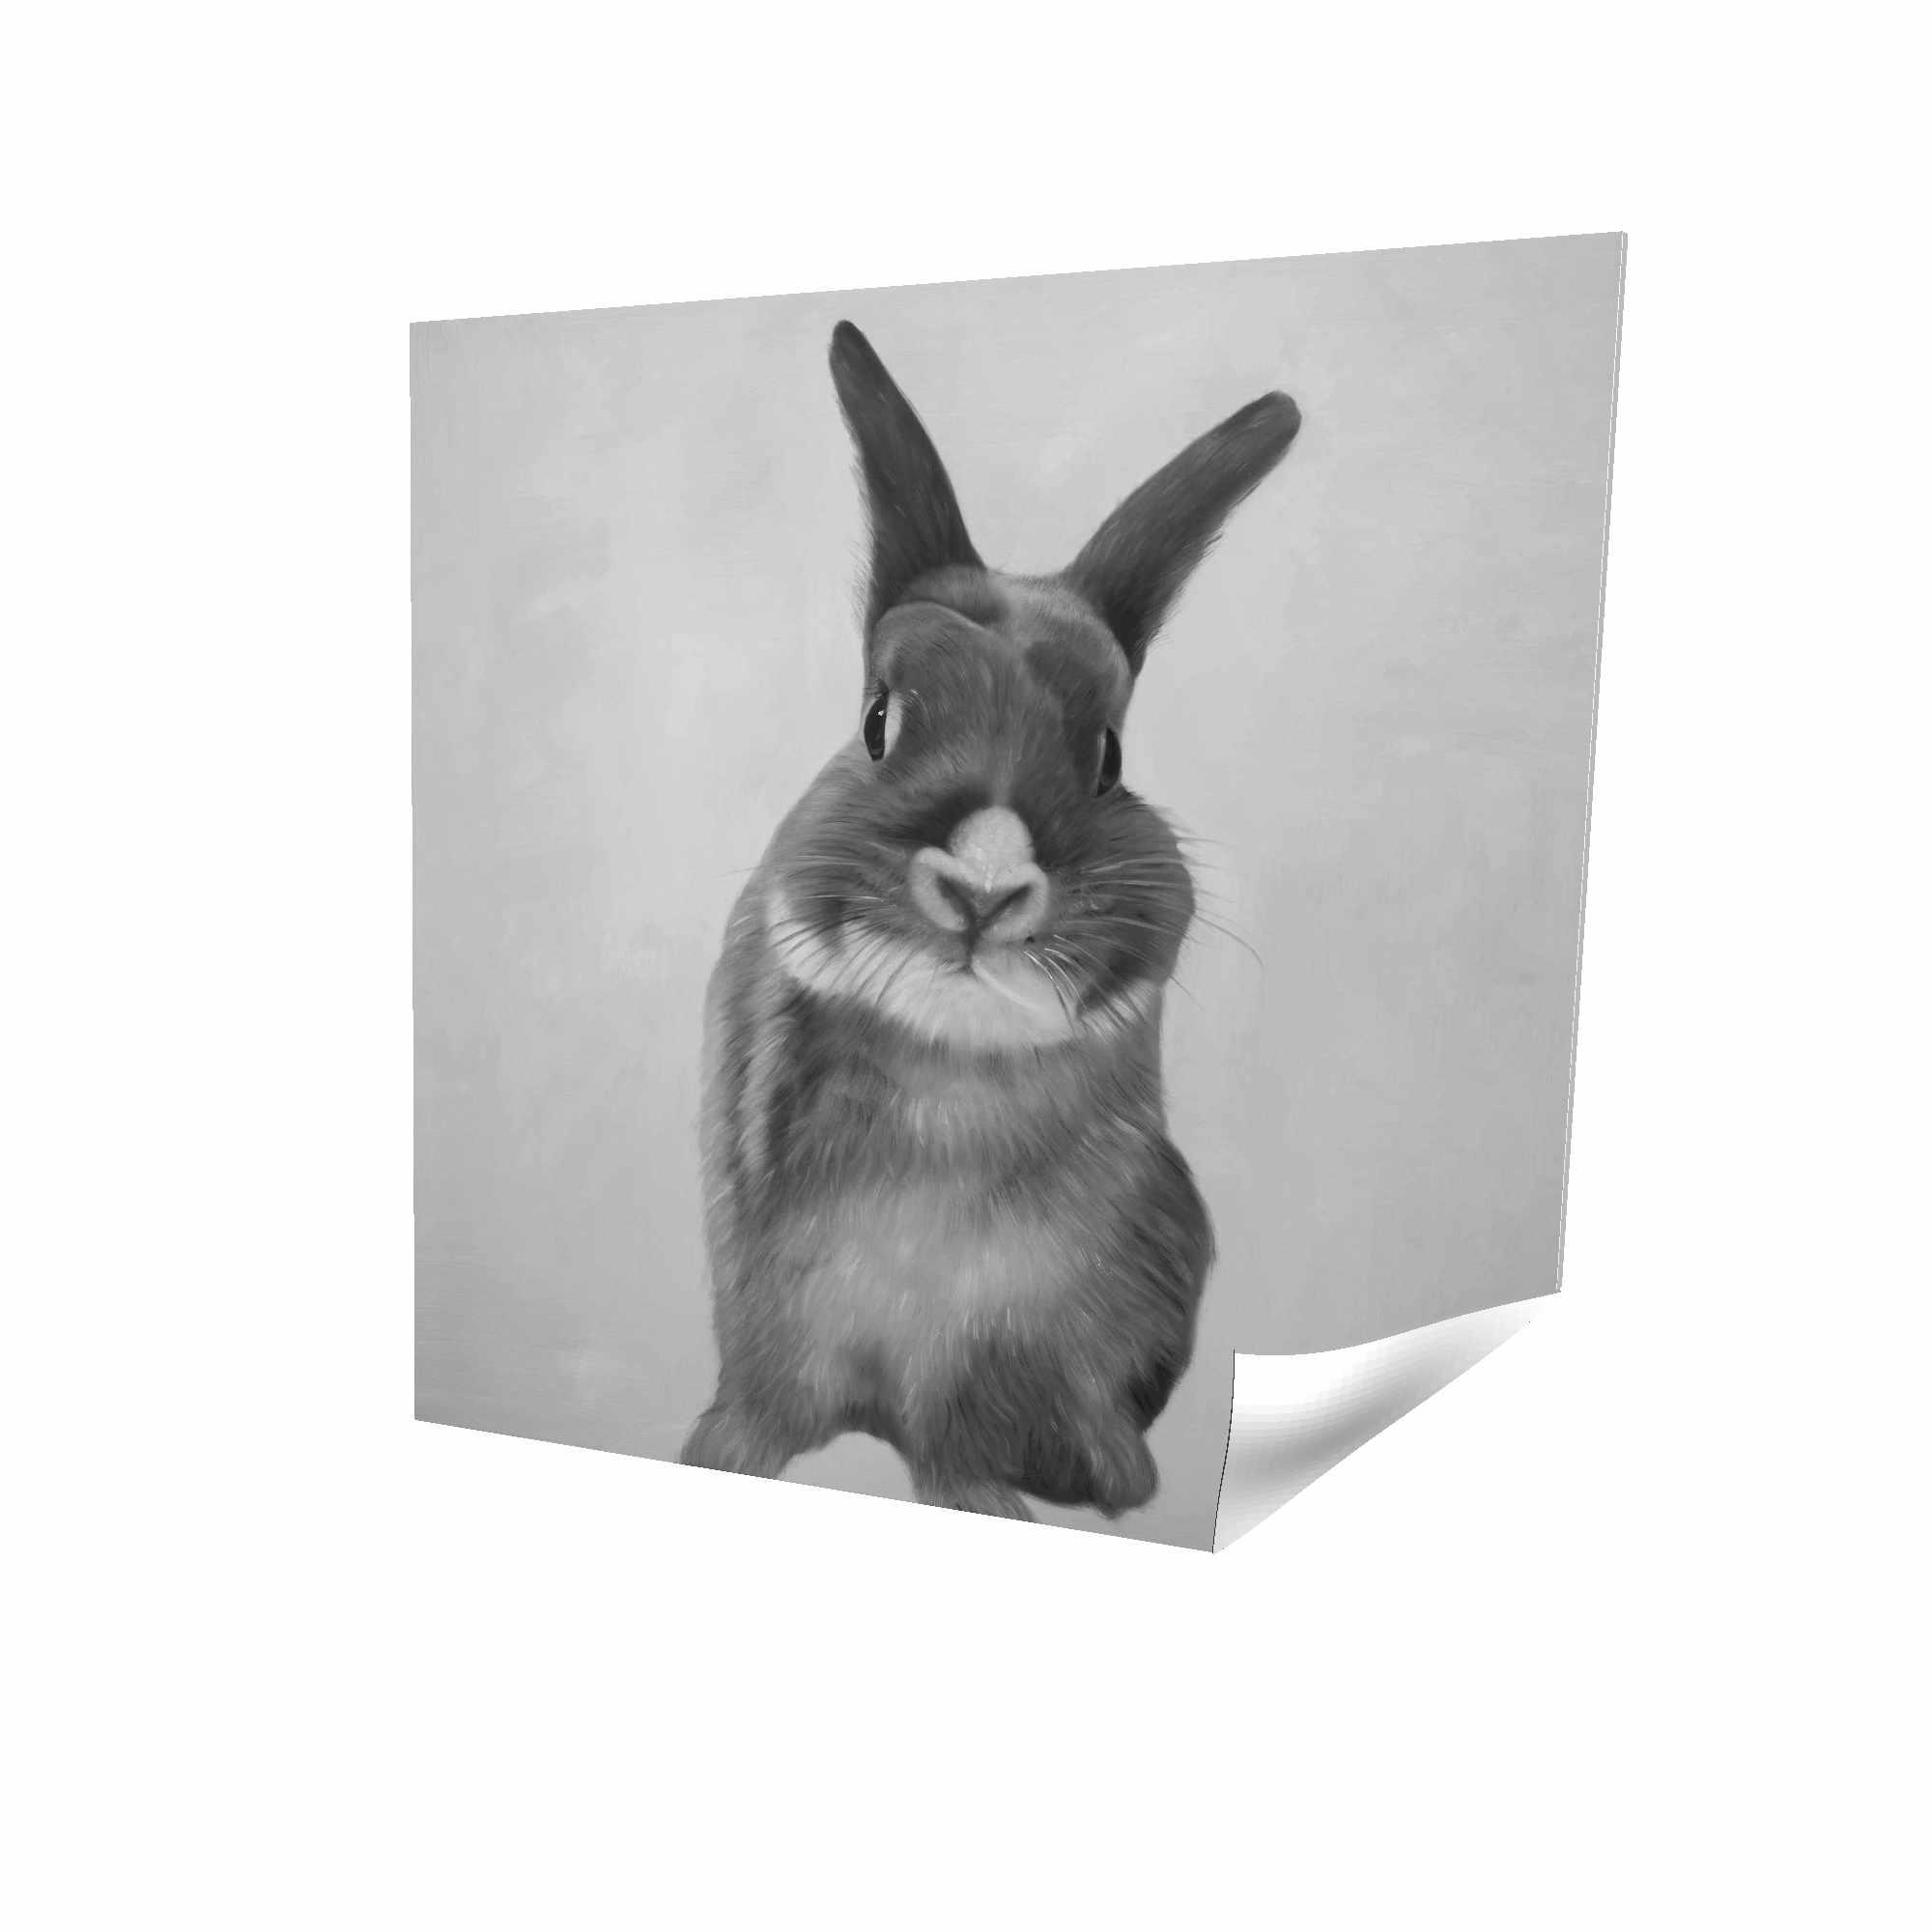 Funny gray rabbit